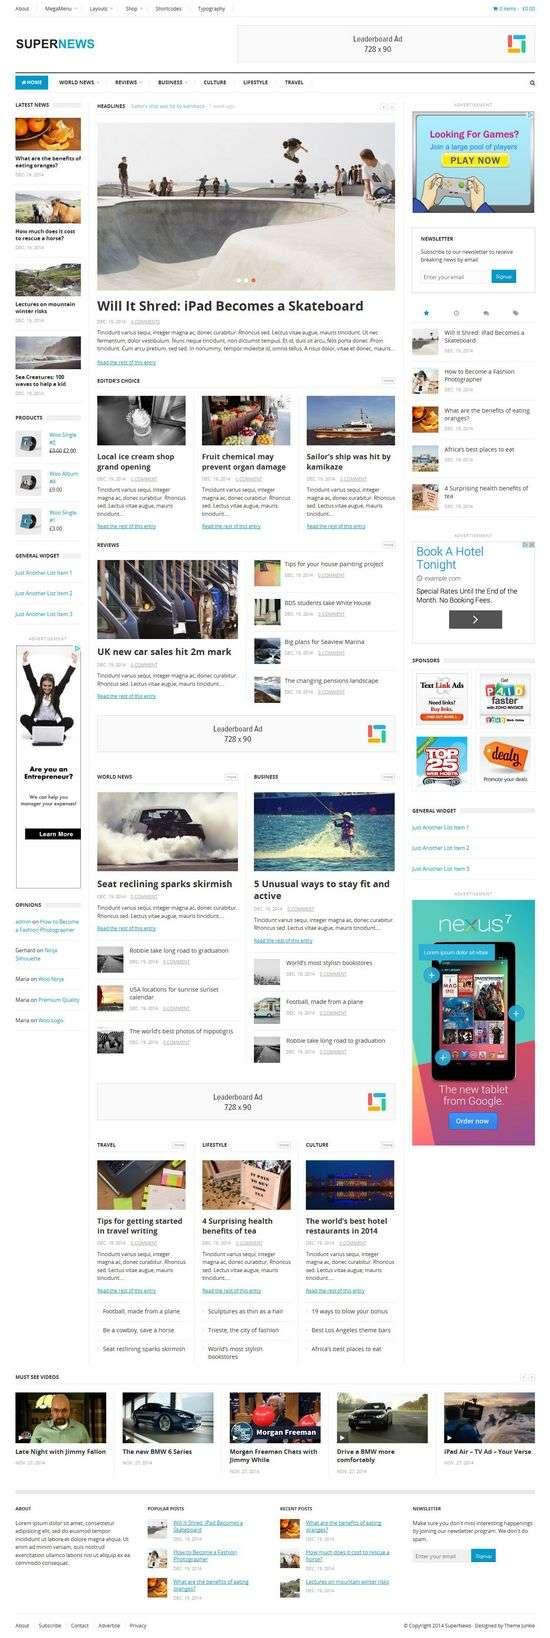 supernews theme junkie 1 - supernews-theme-junkie-1